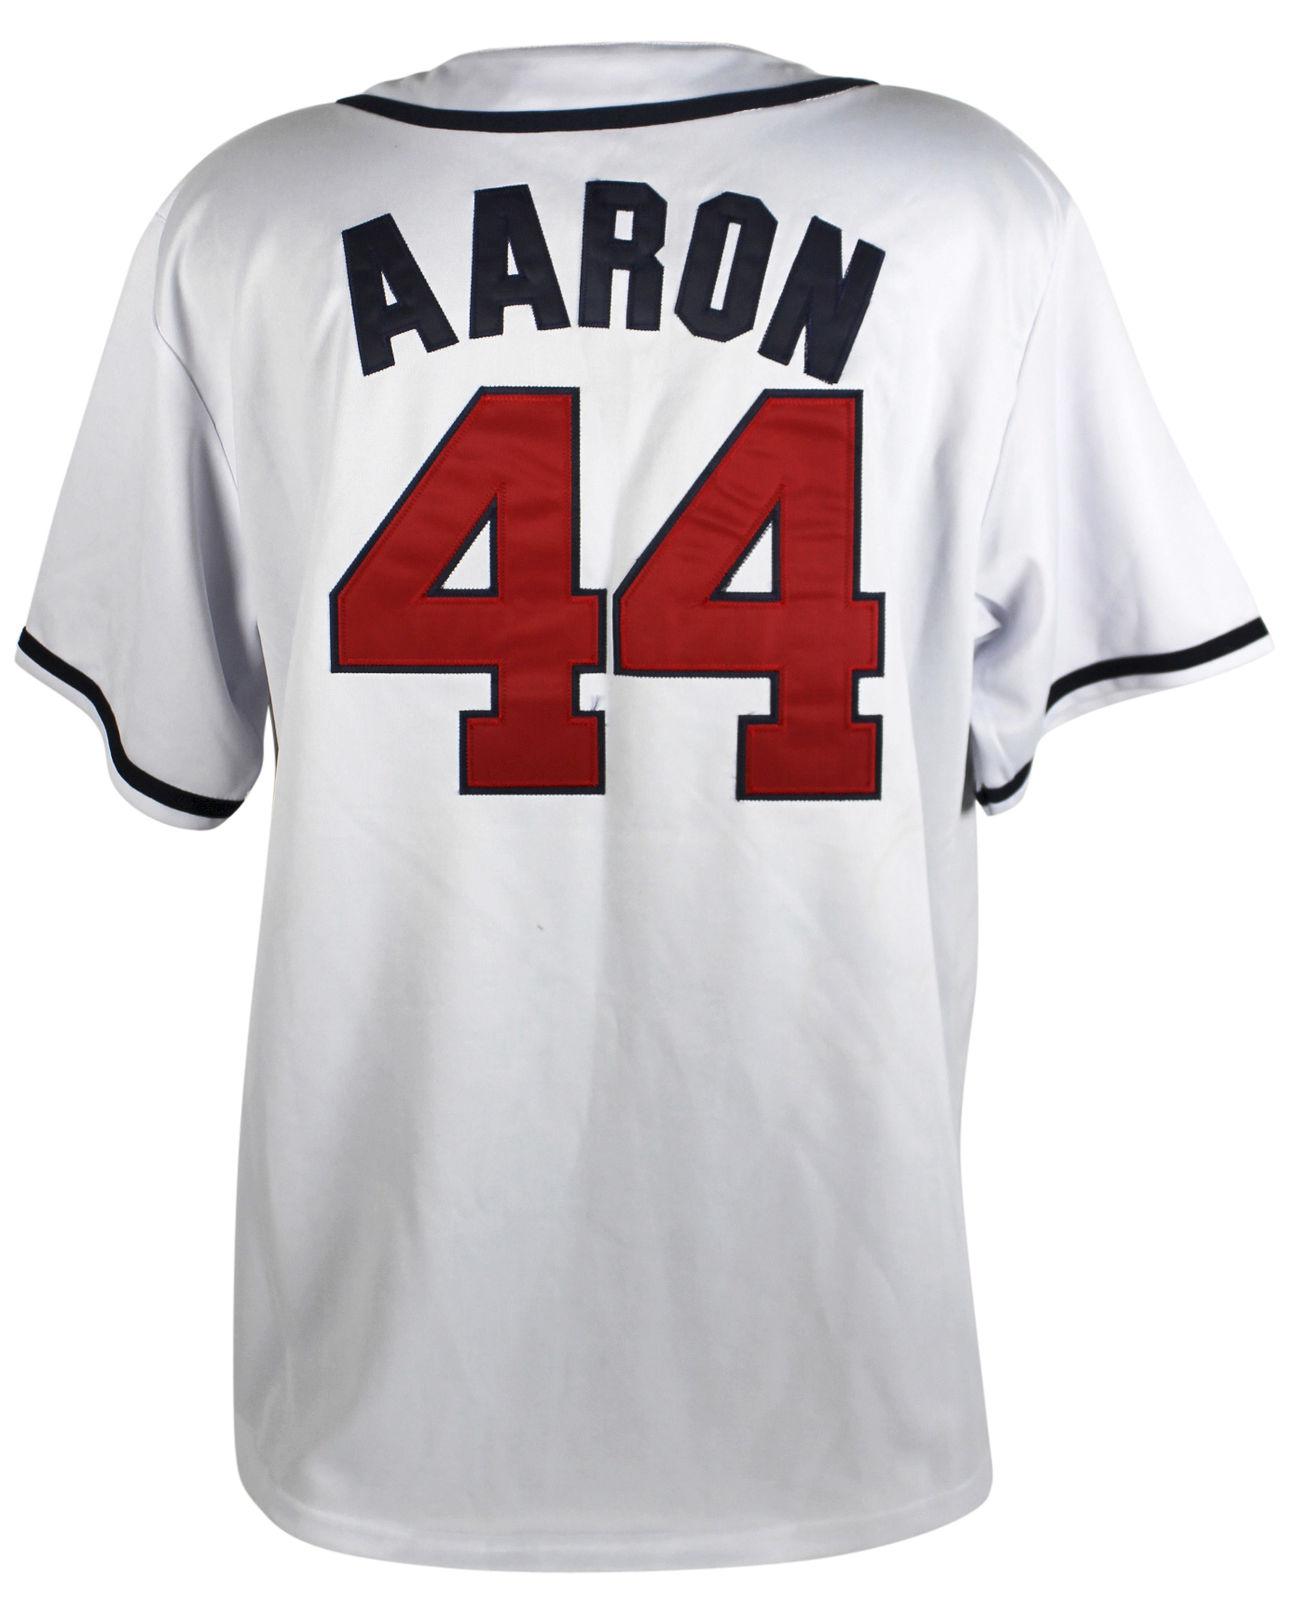 3232460d4 Lot Detail - Hank Aaron Signed Mitchell & Ness Atlanta Braves Jersey ...